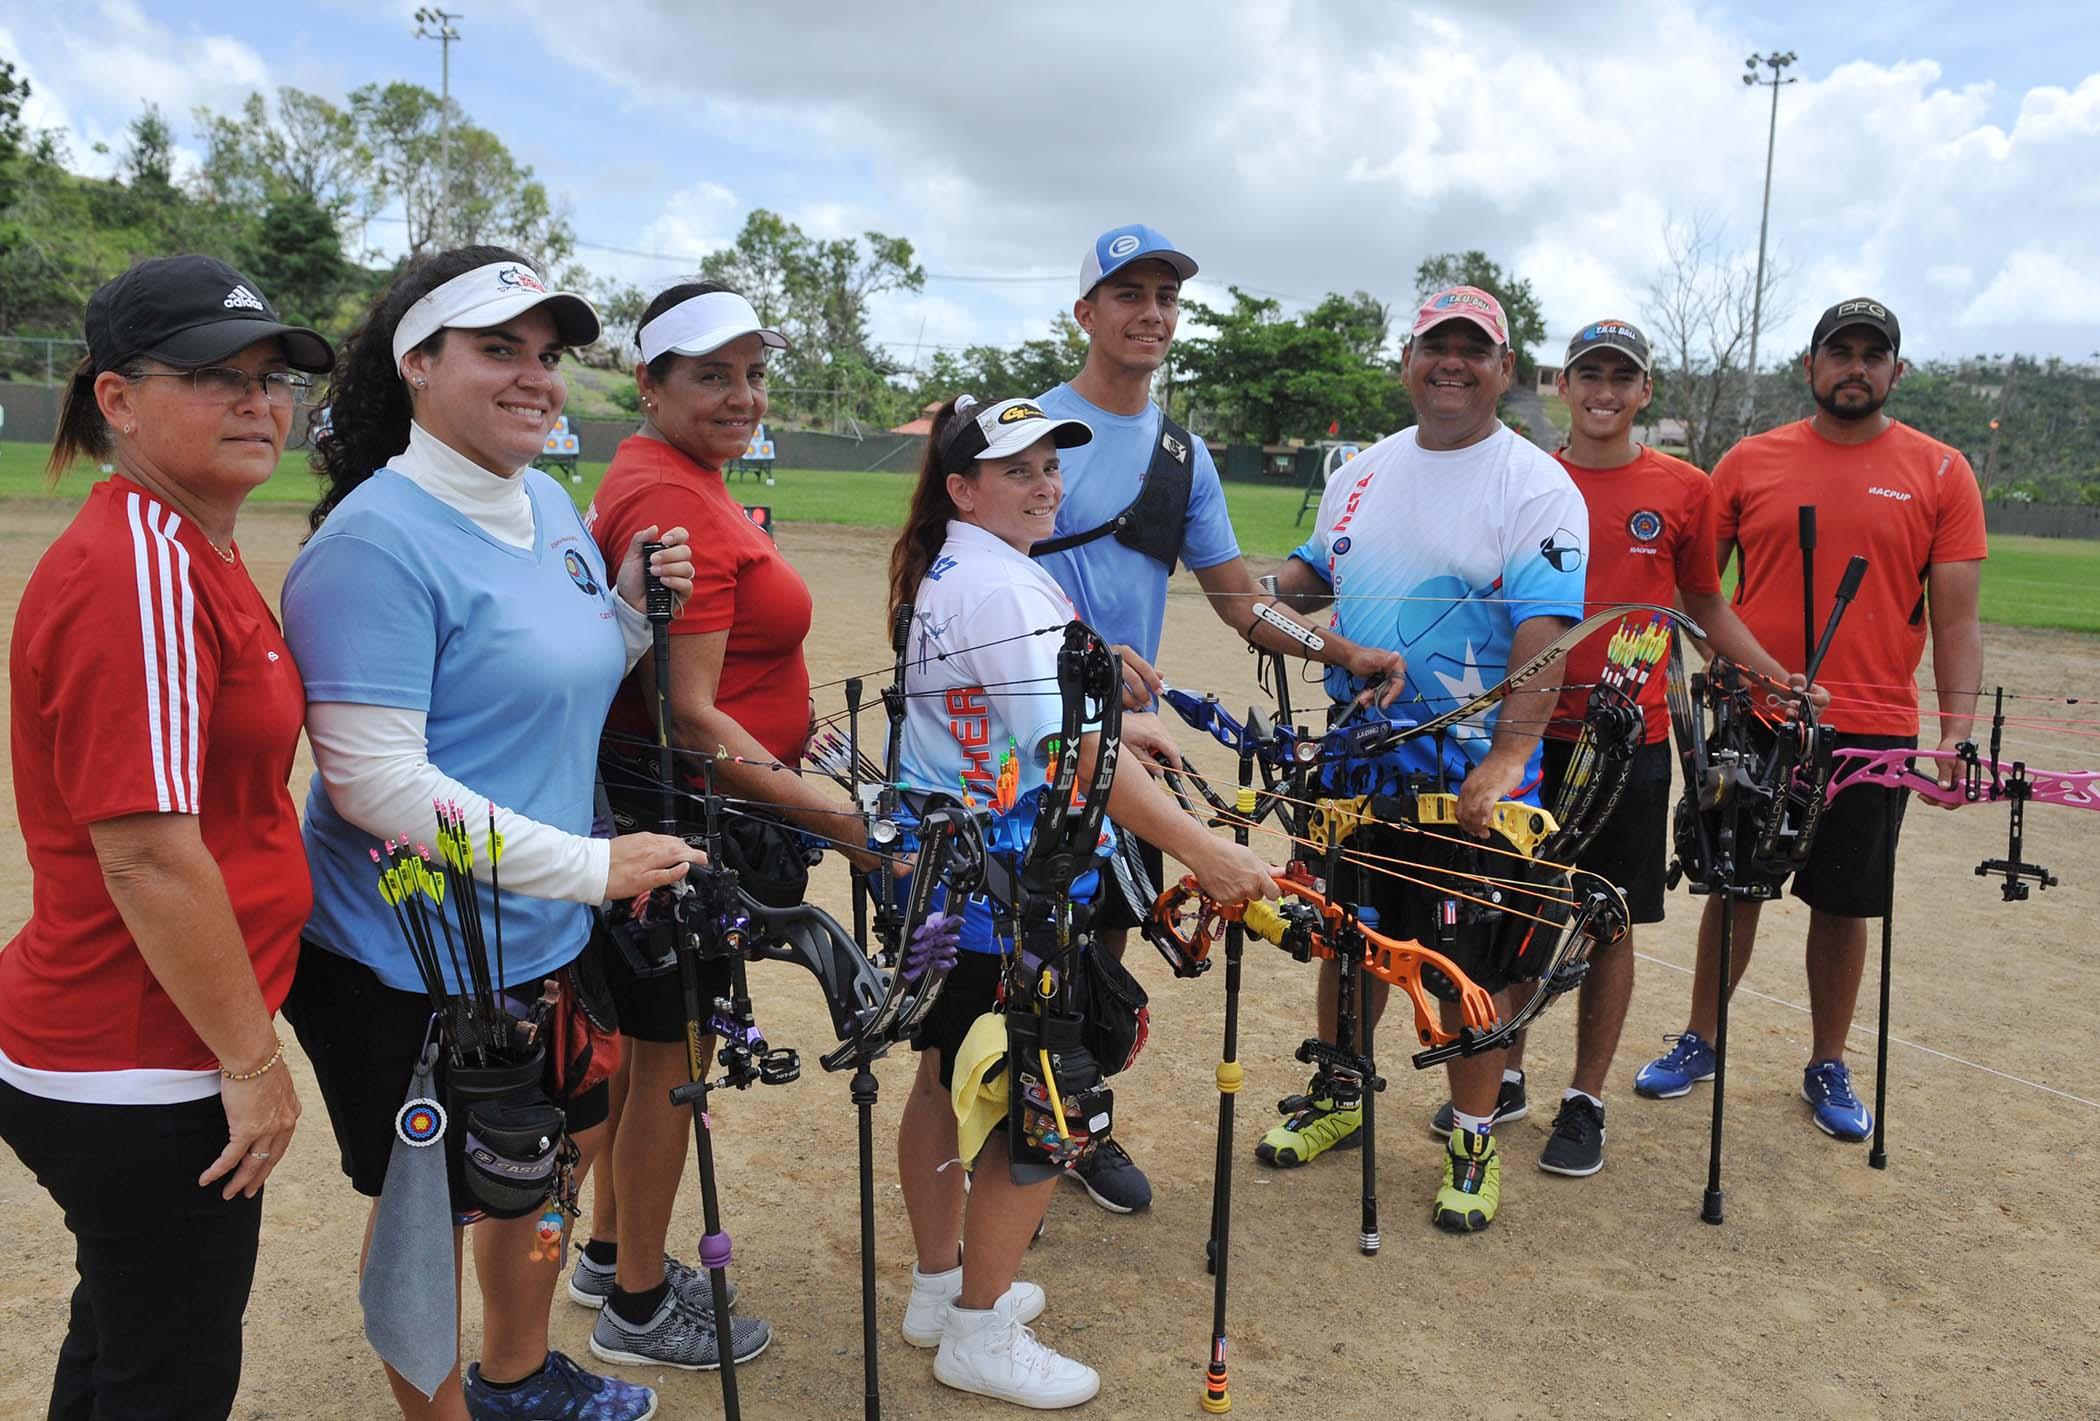 coach Maria Reyes-Marla Cintron-Maria Latorre-Nereida Velez-Adrian Munoz-Jose Reyes-Brian Alvarado-Jan Pizarro-4.jpg